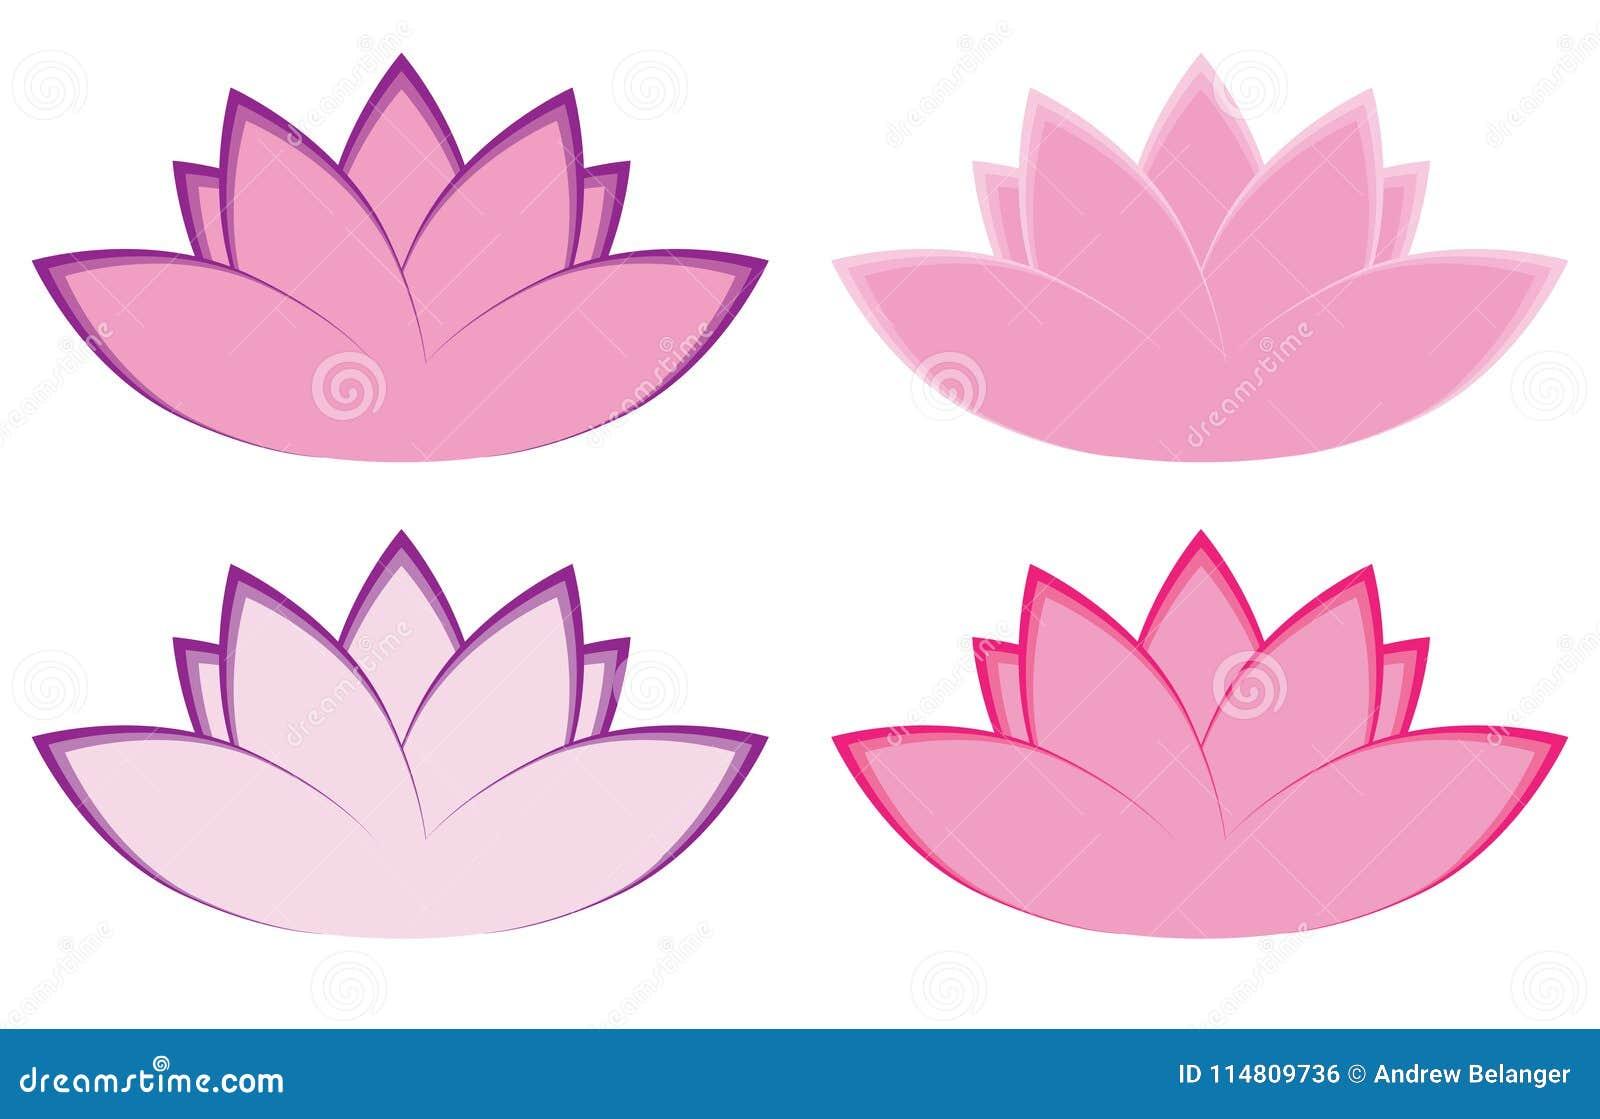 Lotus flower illustrations stock illustration illustration of clean lotus flower illustrations izmirmasajfo